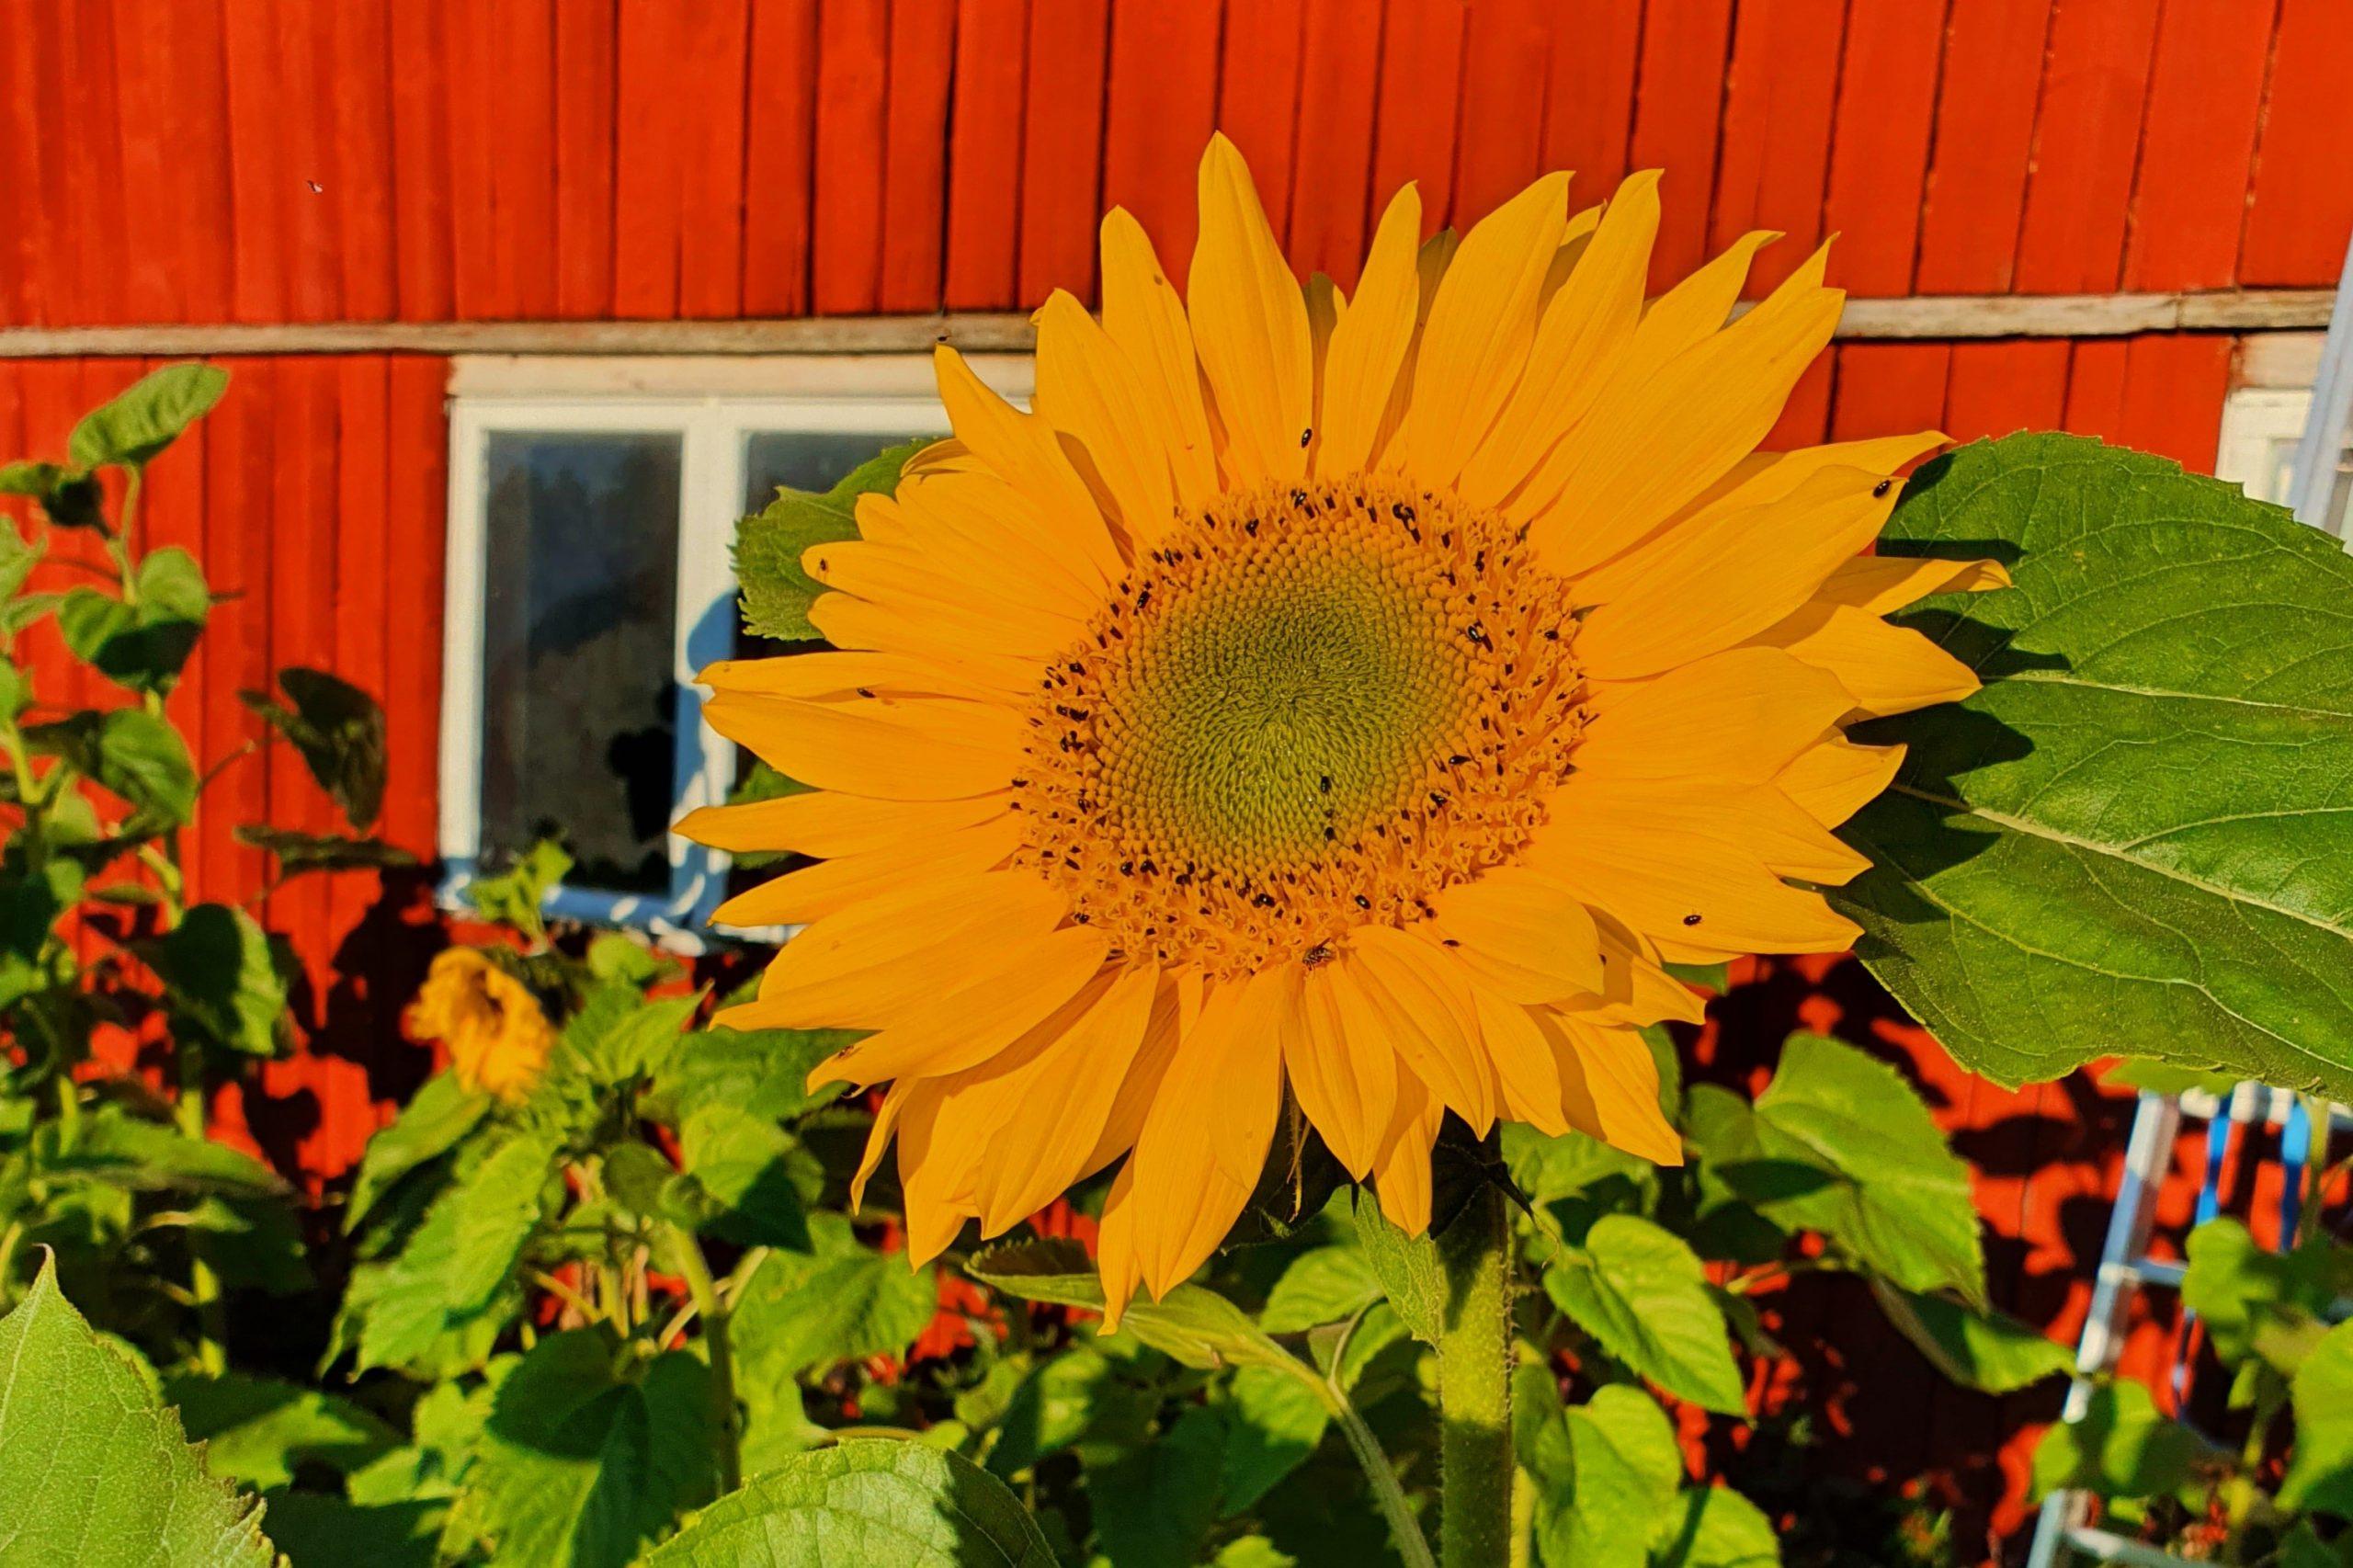 Över 200 deltagare i årets solrostävling featured image